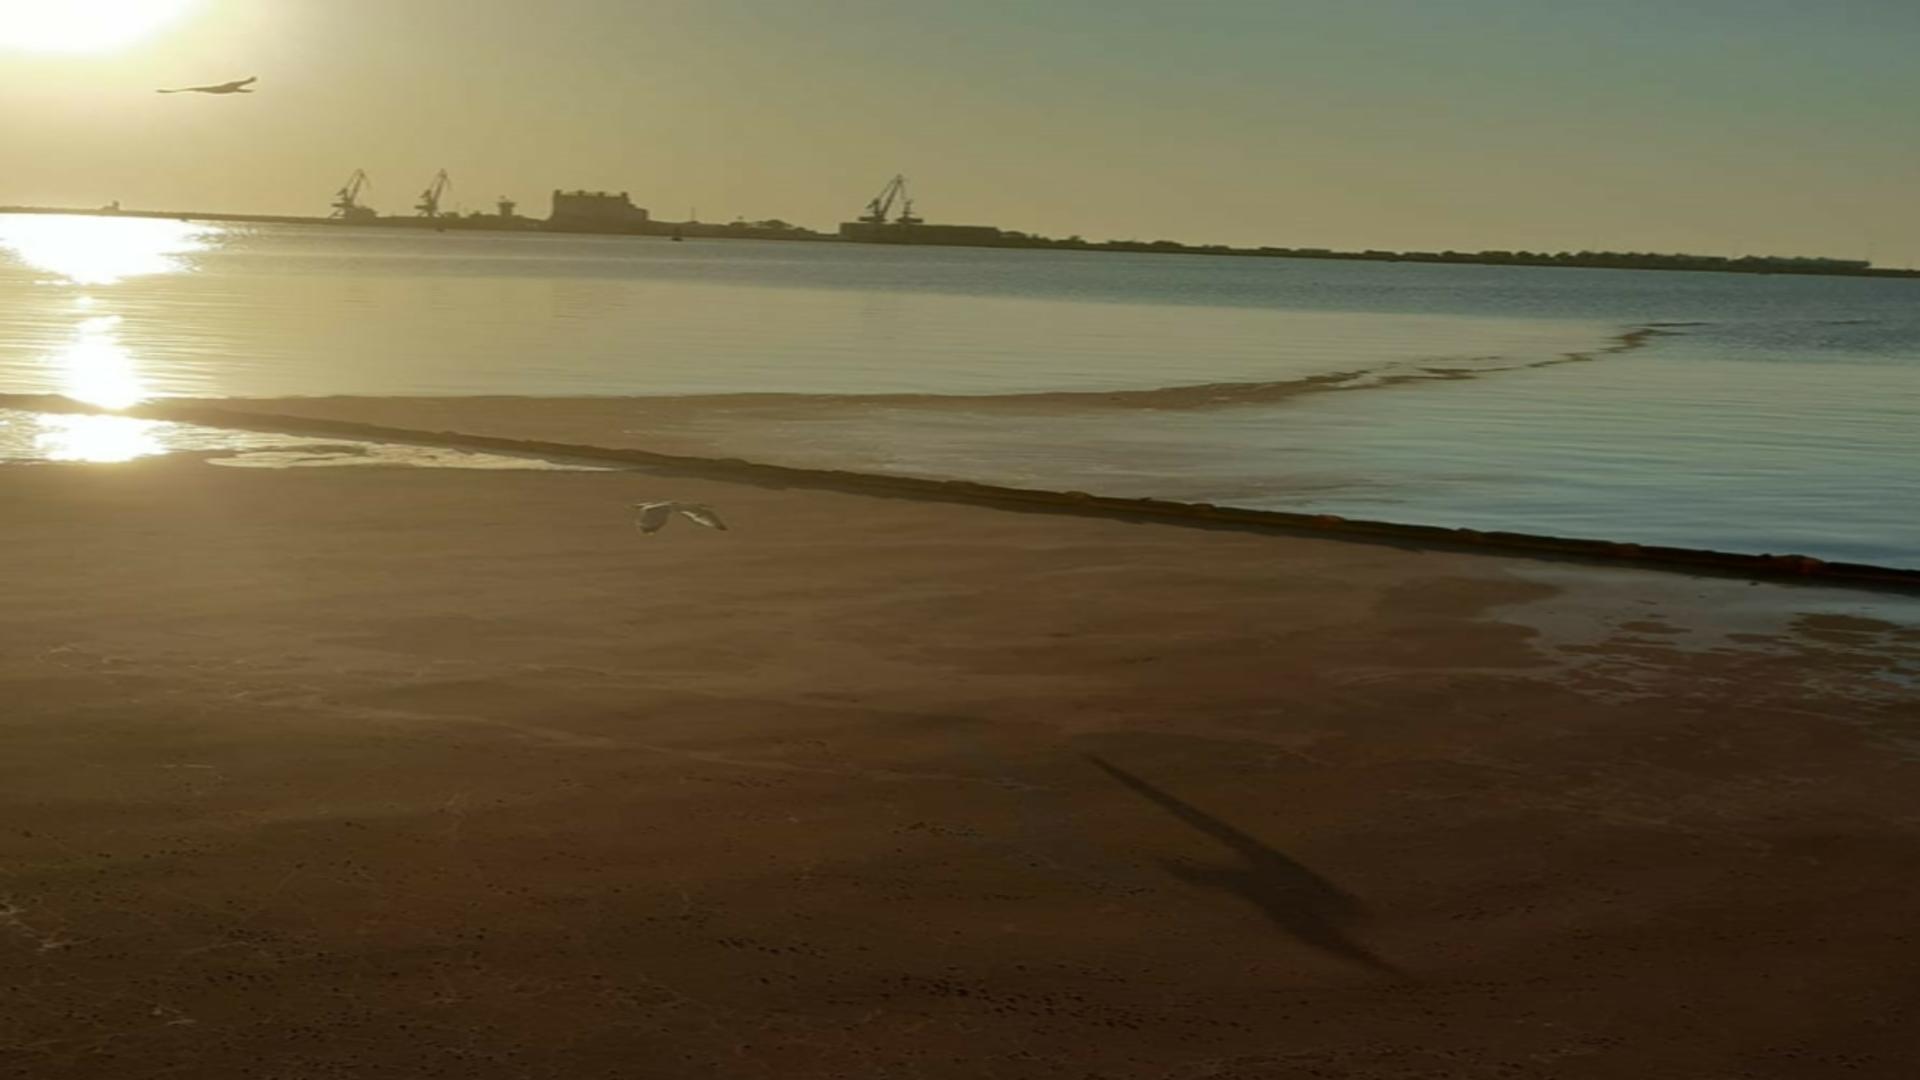 Poluare Șantier Naval Damen Mangalia